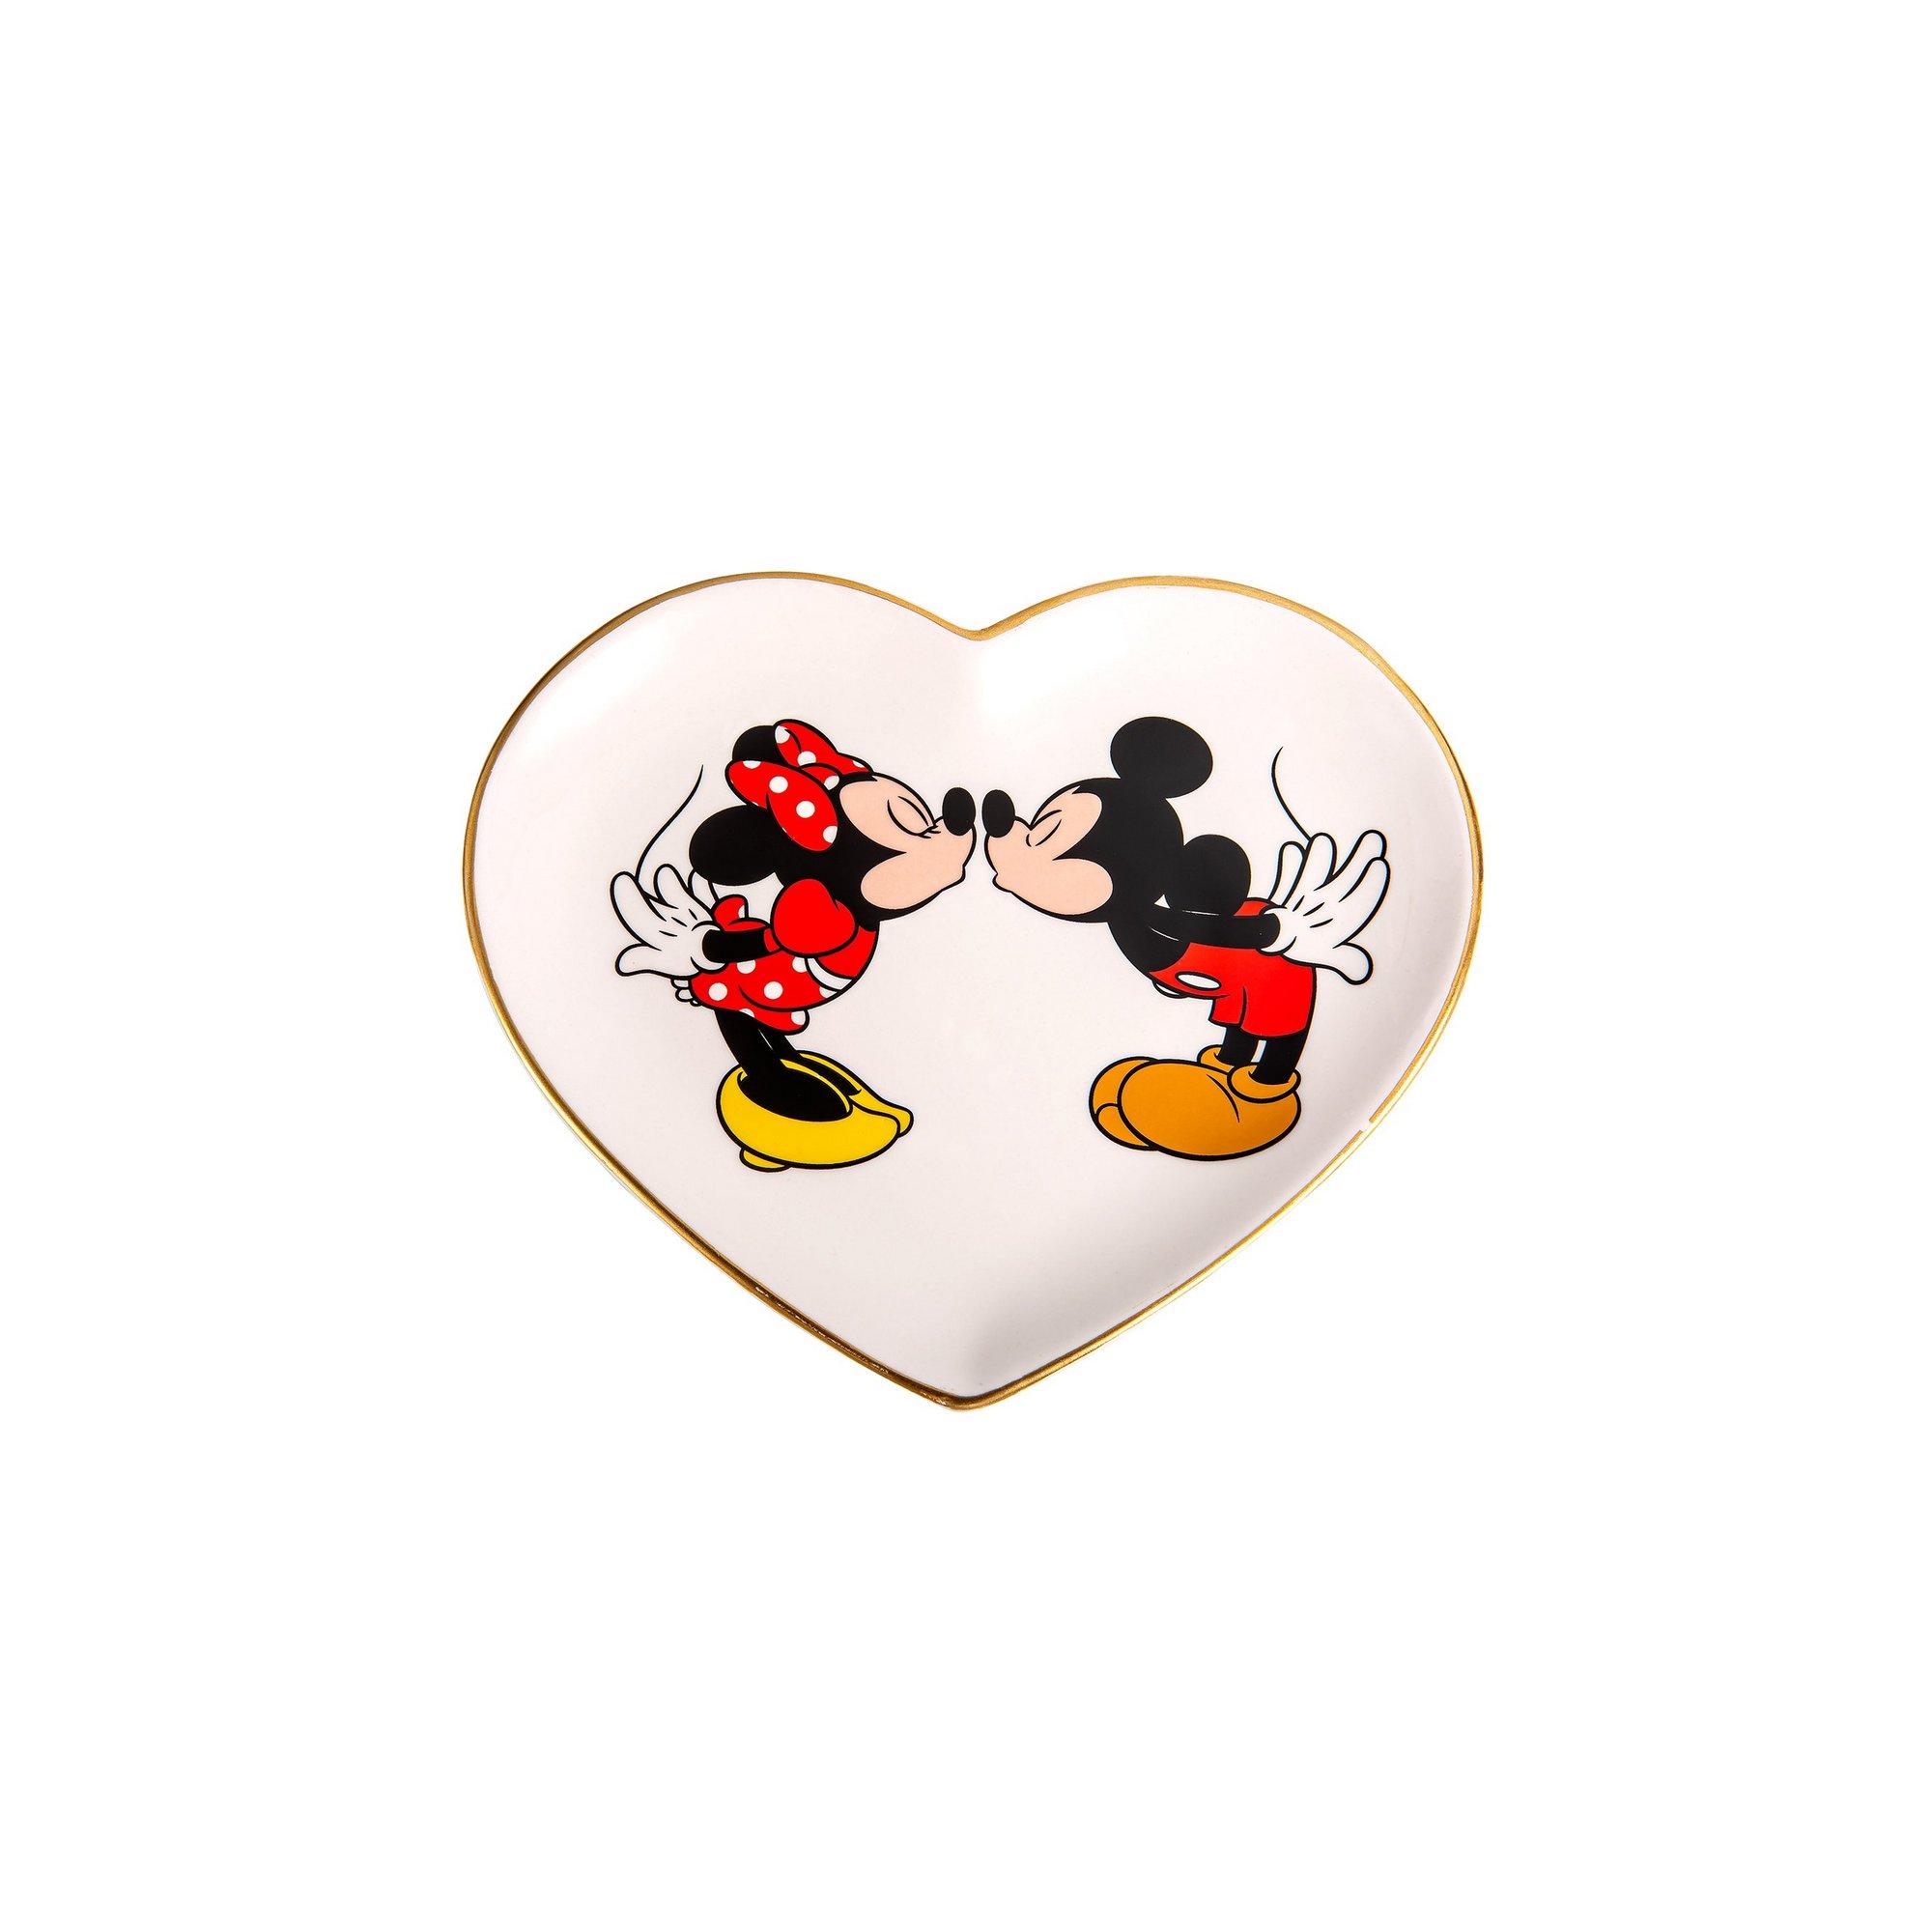 Image of Disney Minnie and Mickey Heart Shaped Trinket Tray